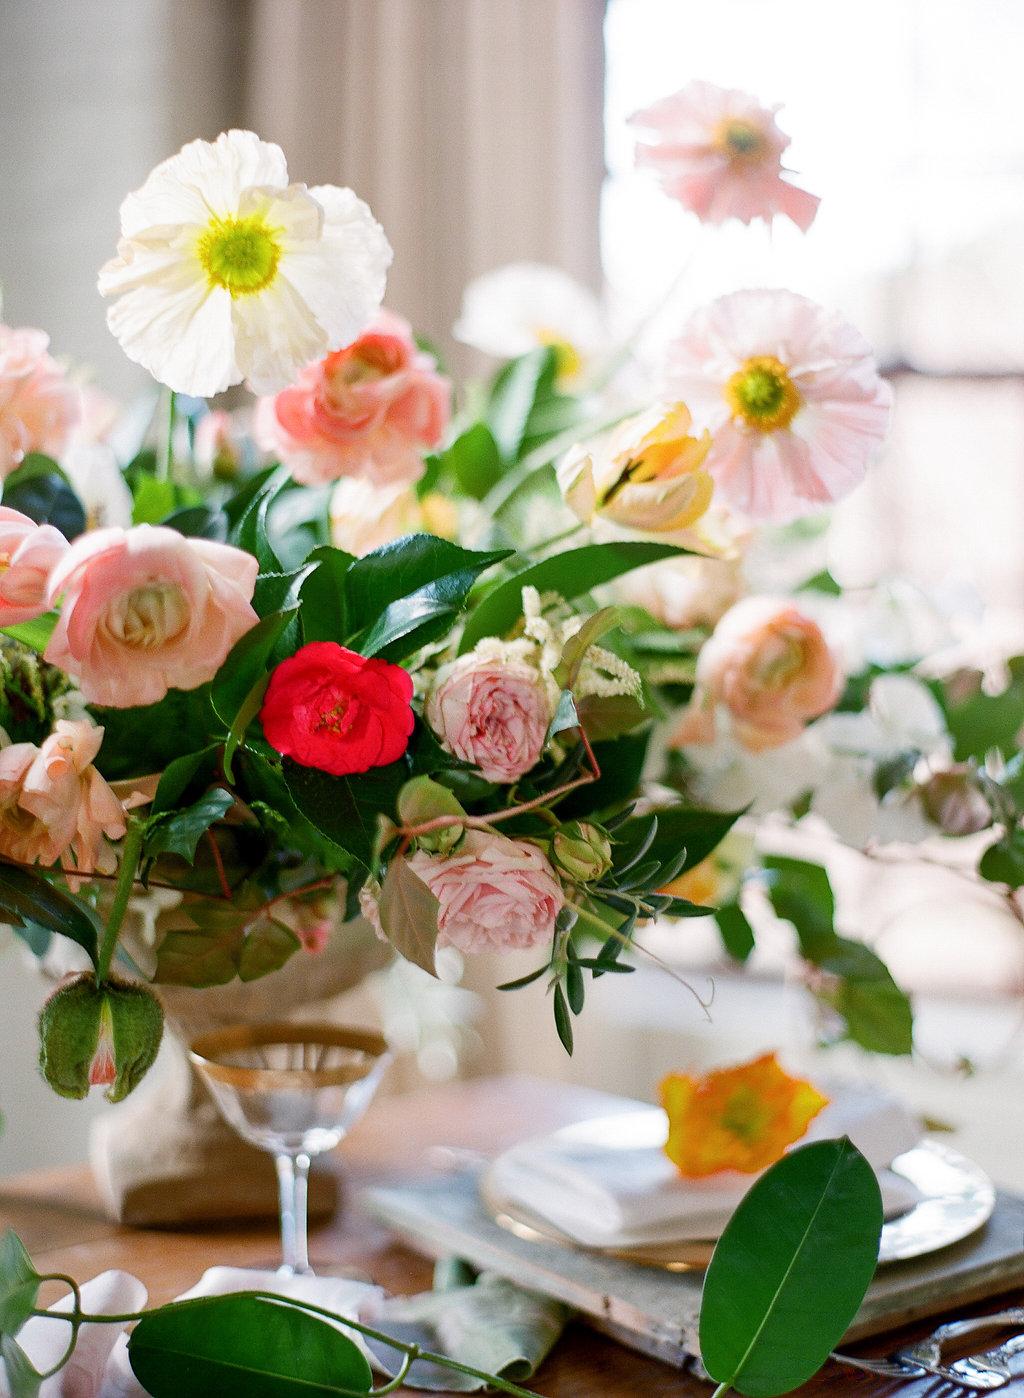 kristen_lynne_photography_early_mountain_vineyard_wedding-61